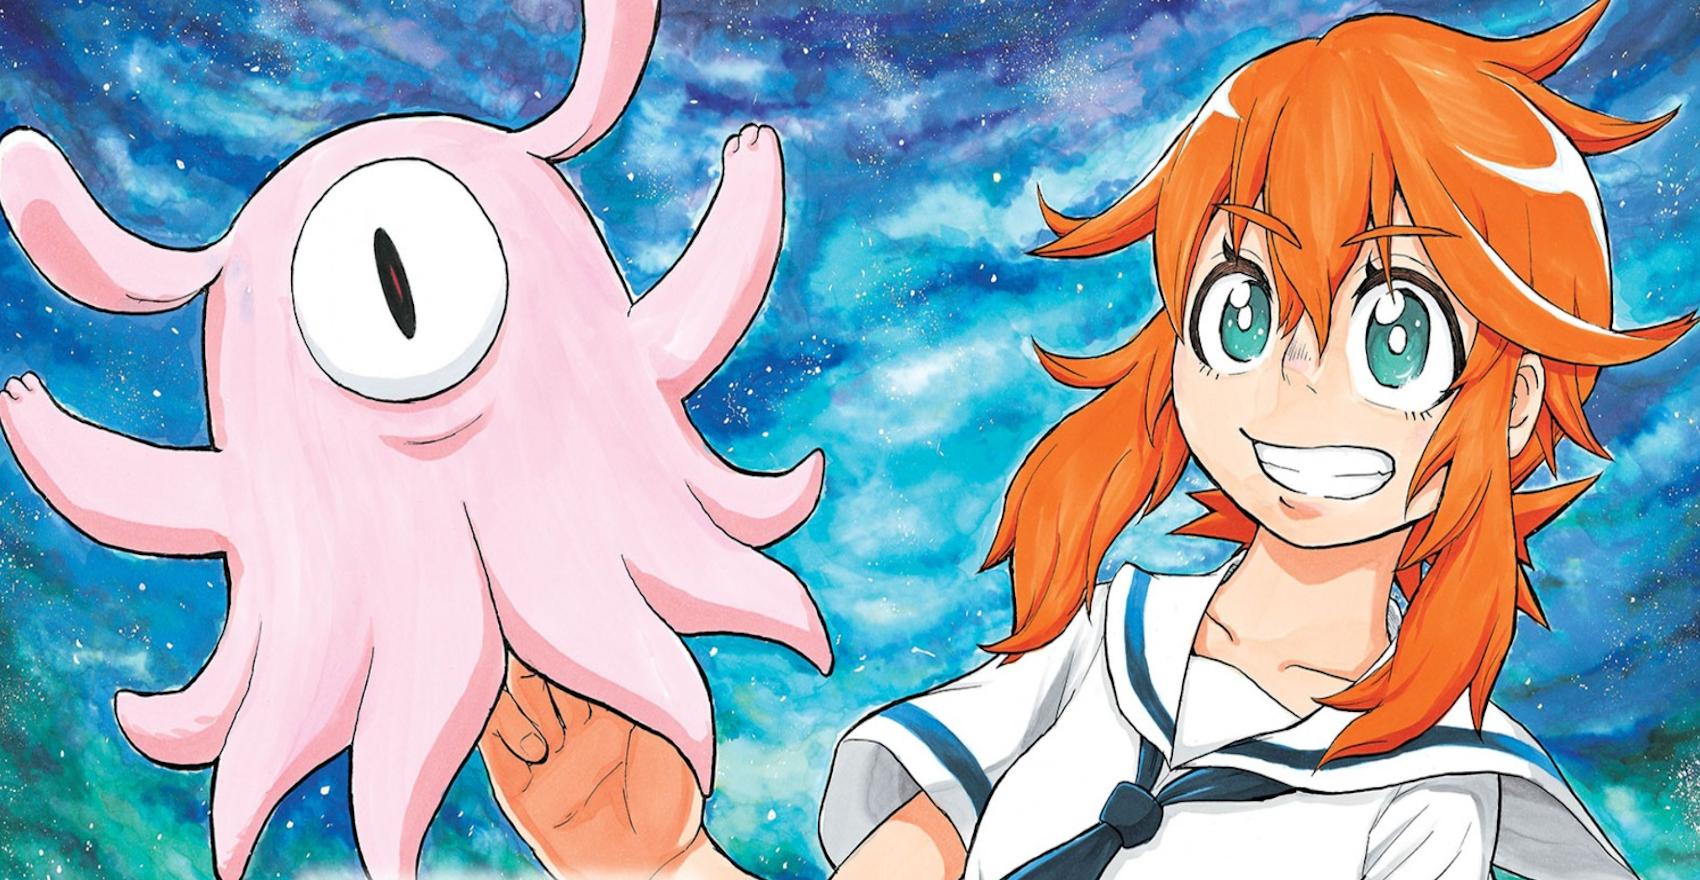 Magu-chan: God of Destruction Chapter 20 Release date